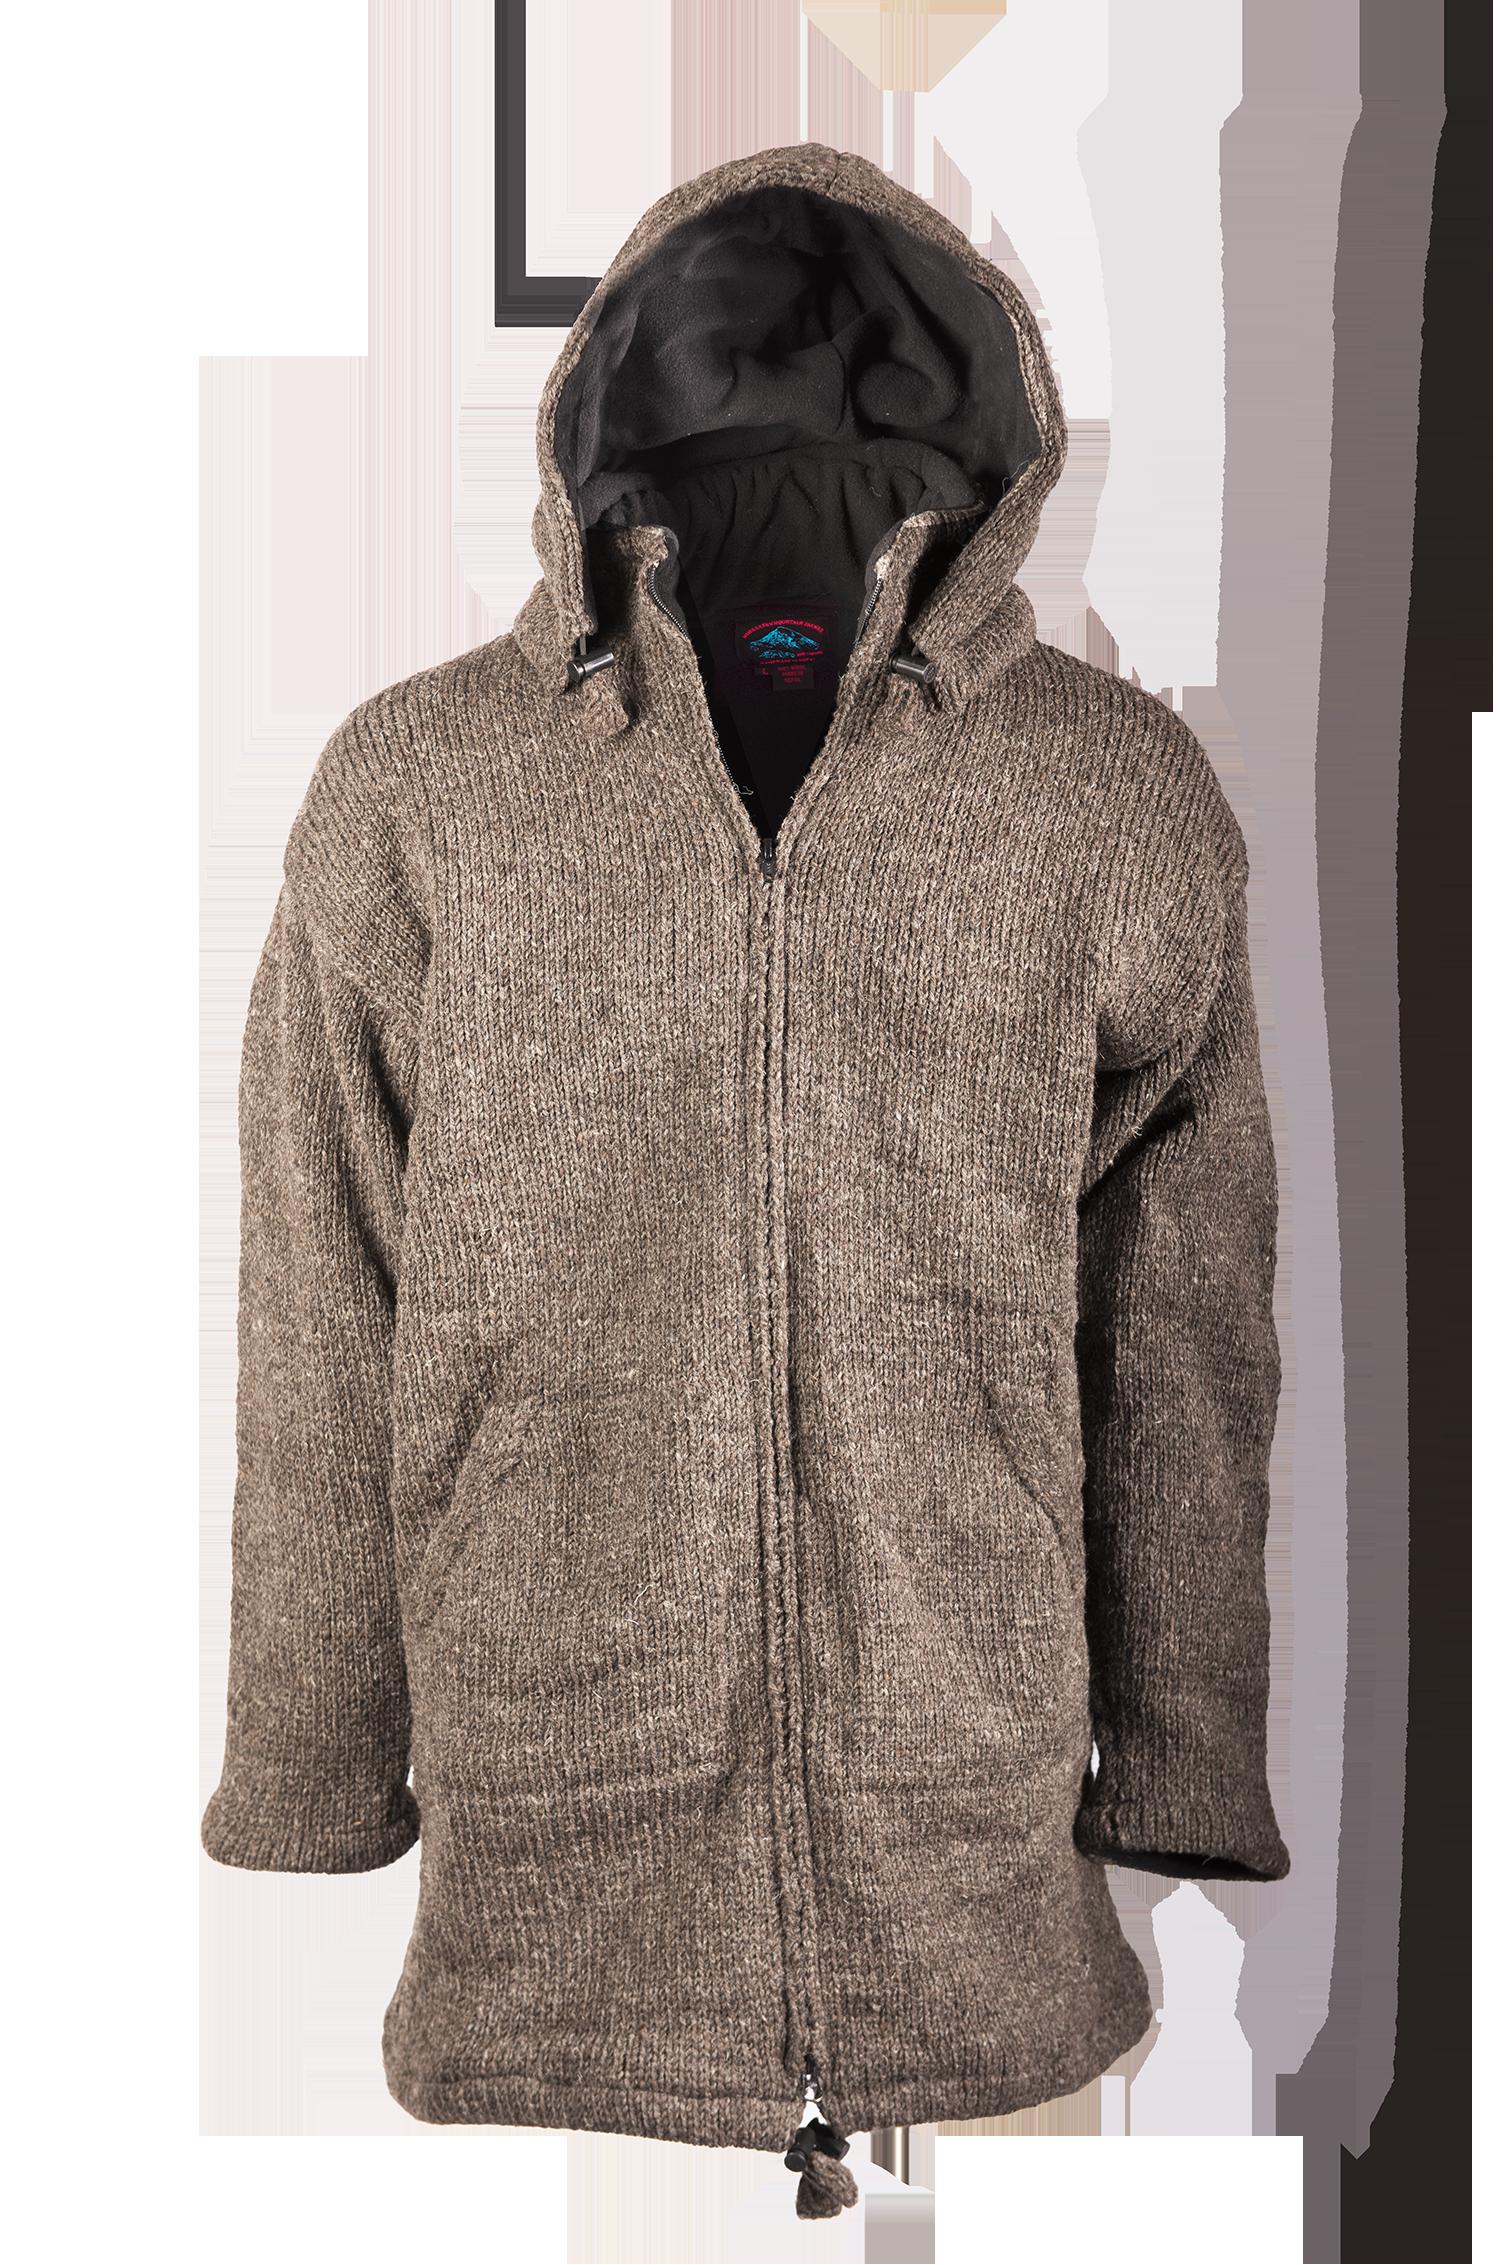 Himalayan Mountain Jacket Long Length, Solid Charcoal